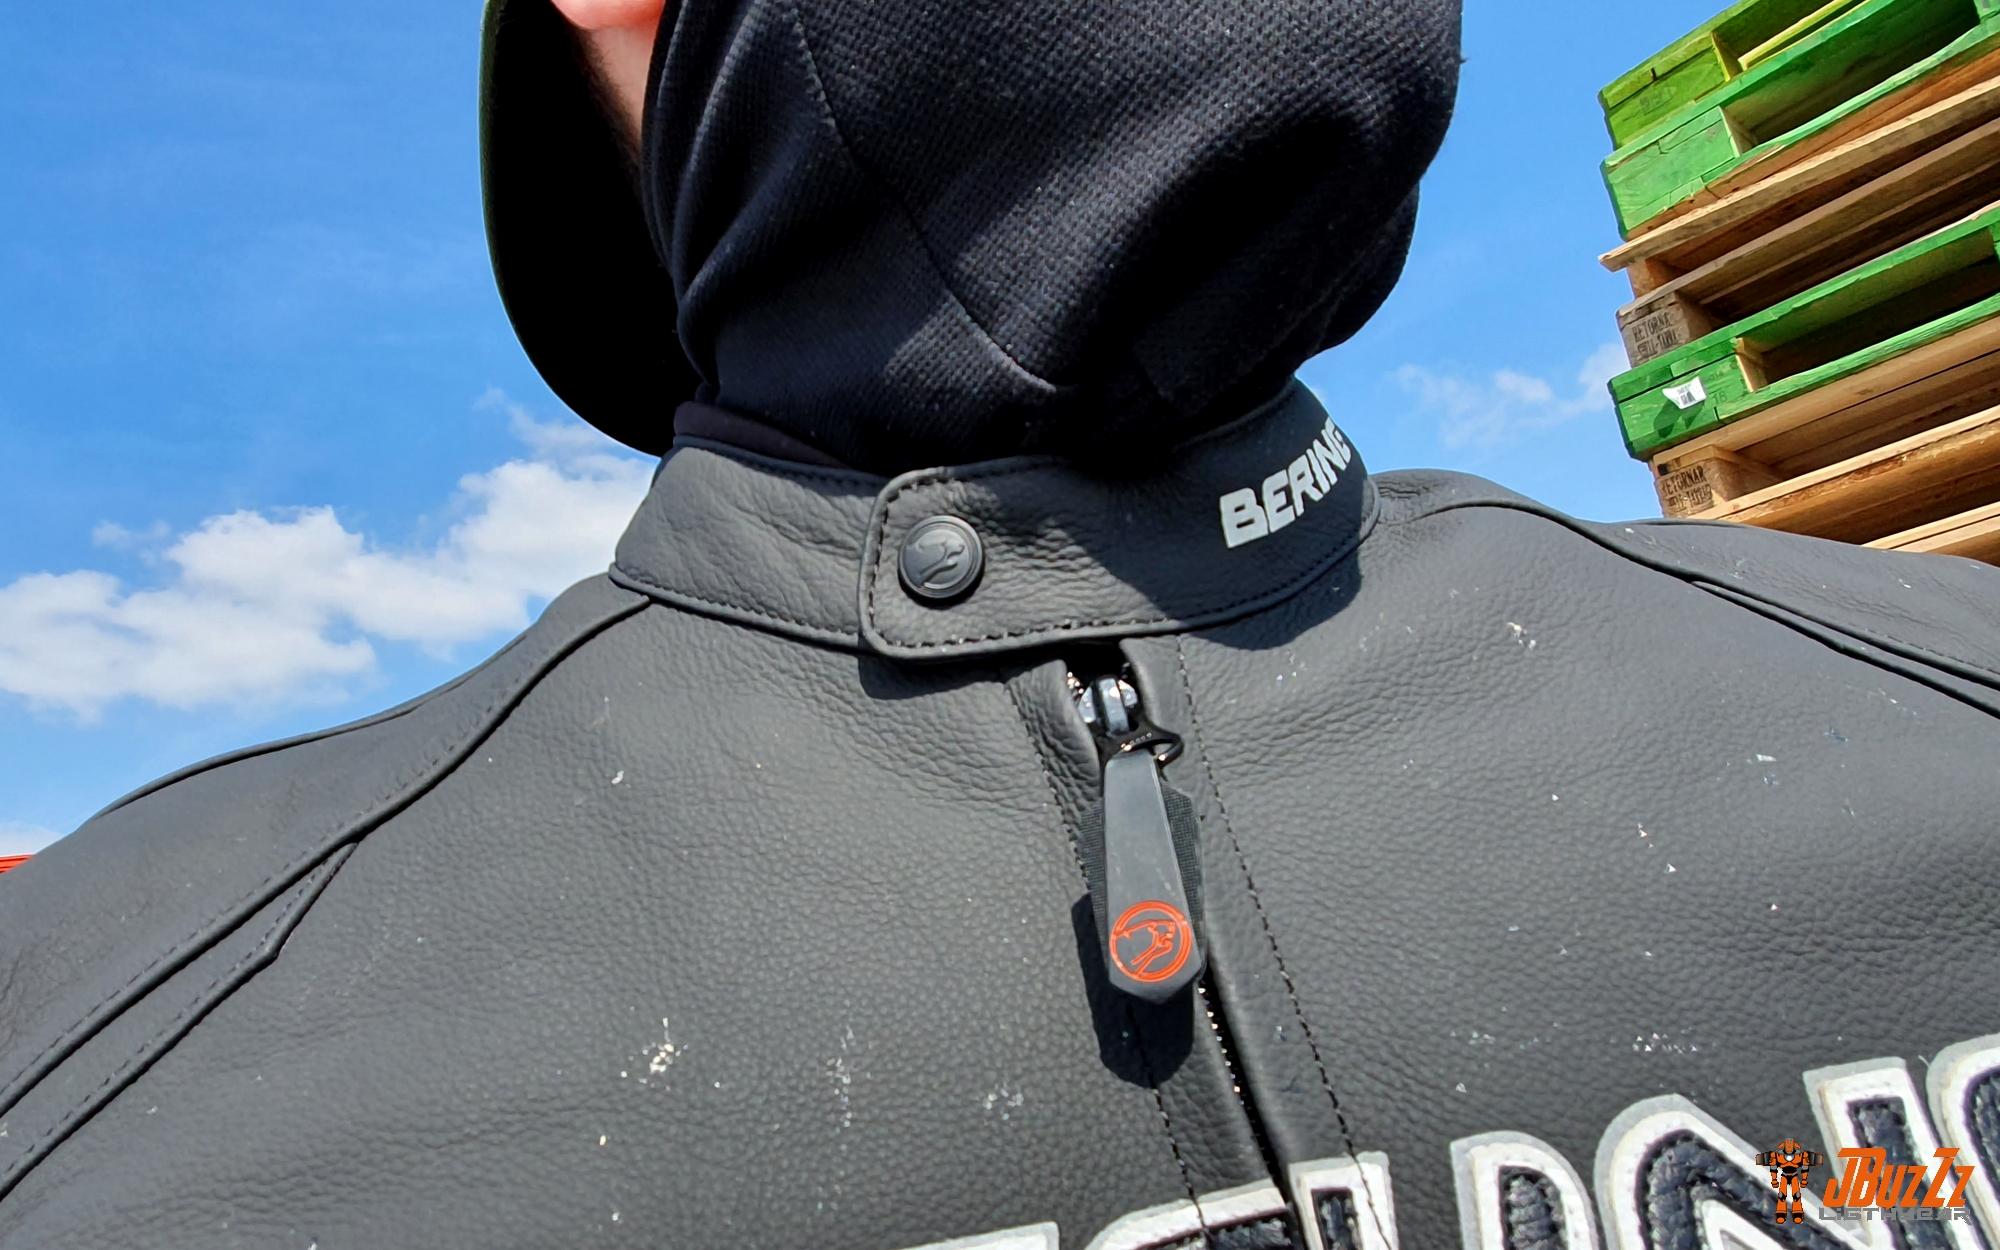 Bouton pression sur le col du blouson Bering Kingston Evo